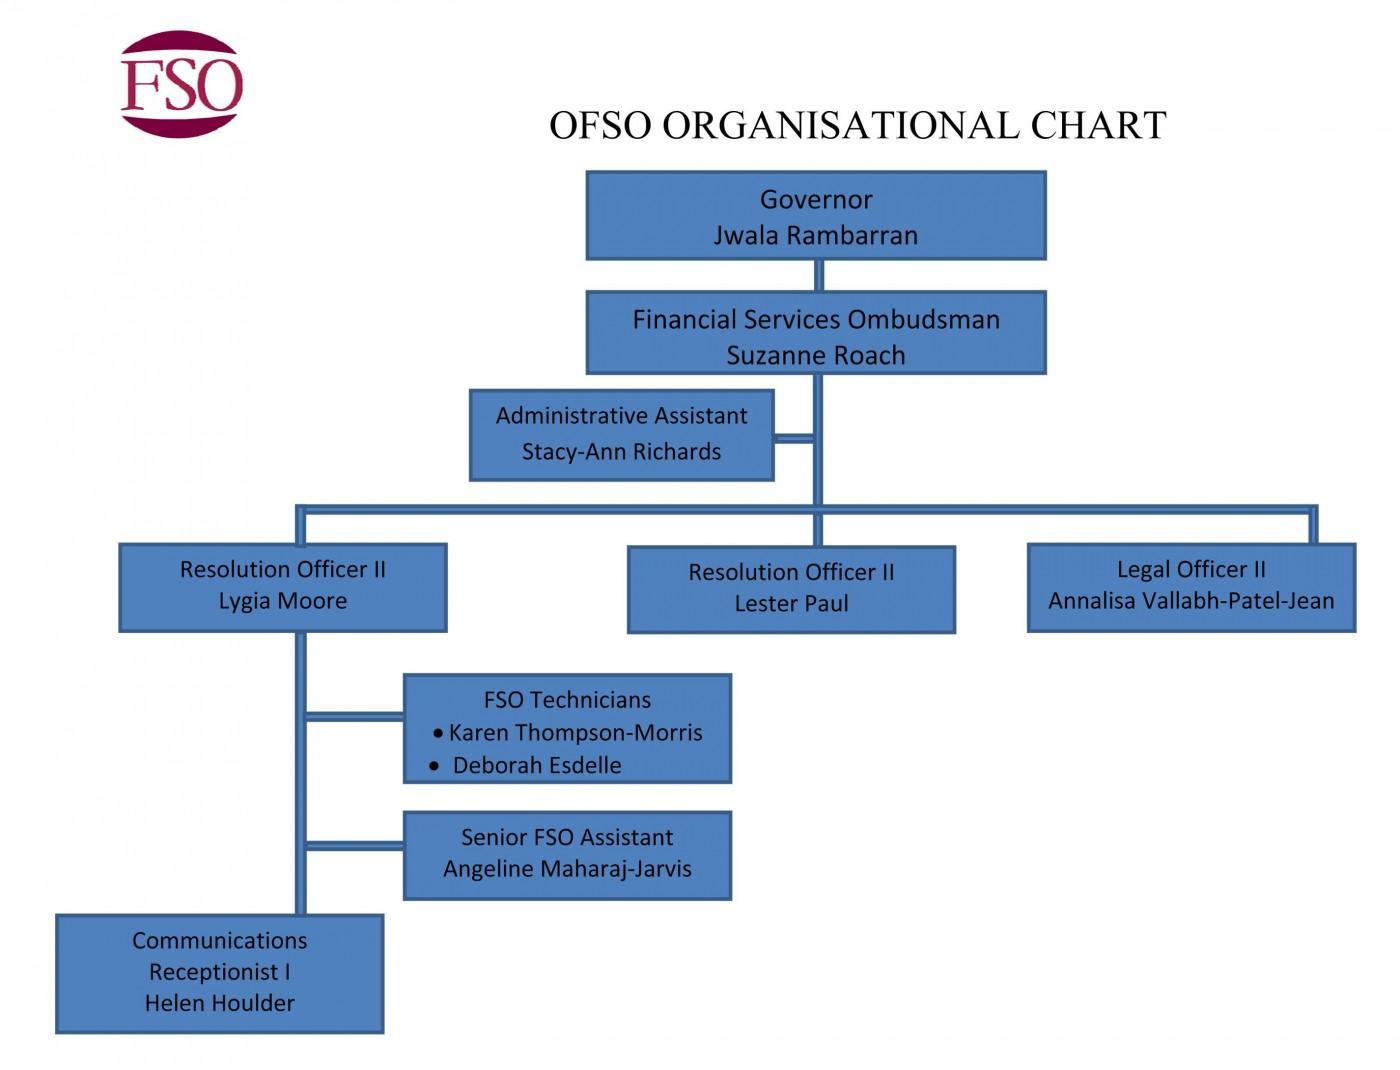 003 Unusual Organization Chart Template Word 2013 Idea  Organizational Free Microsoft1400